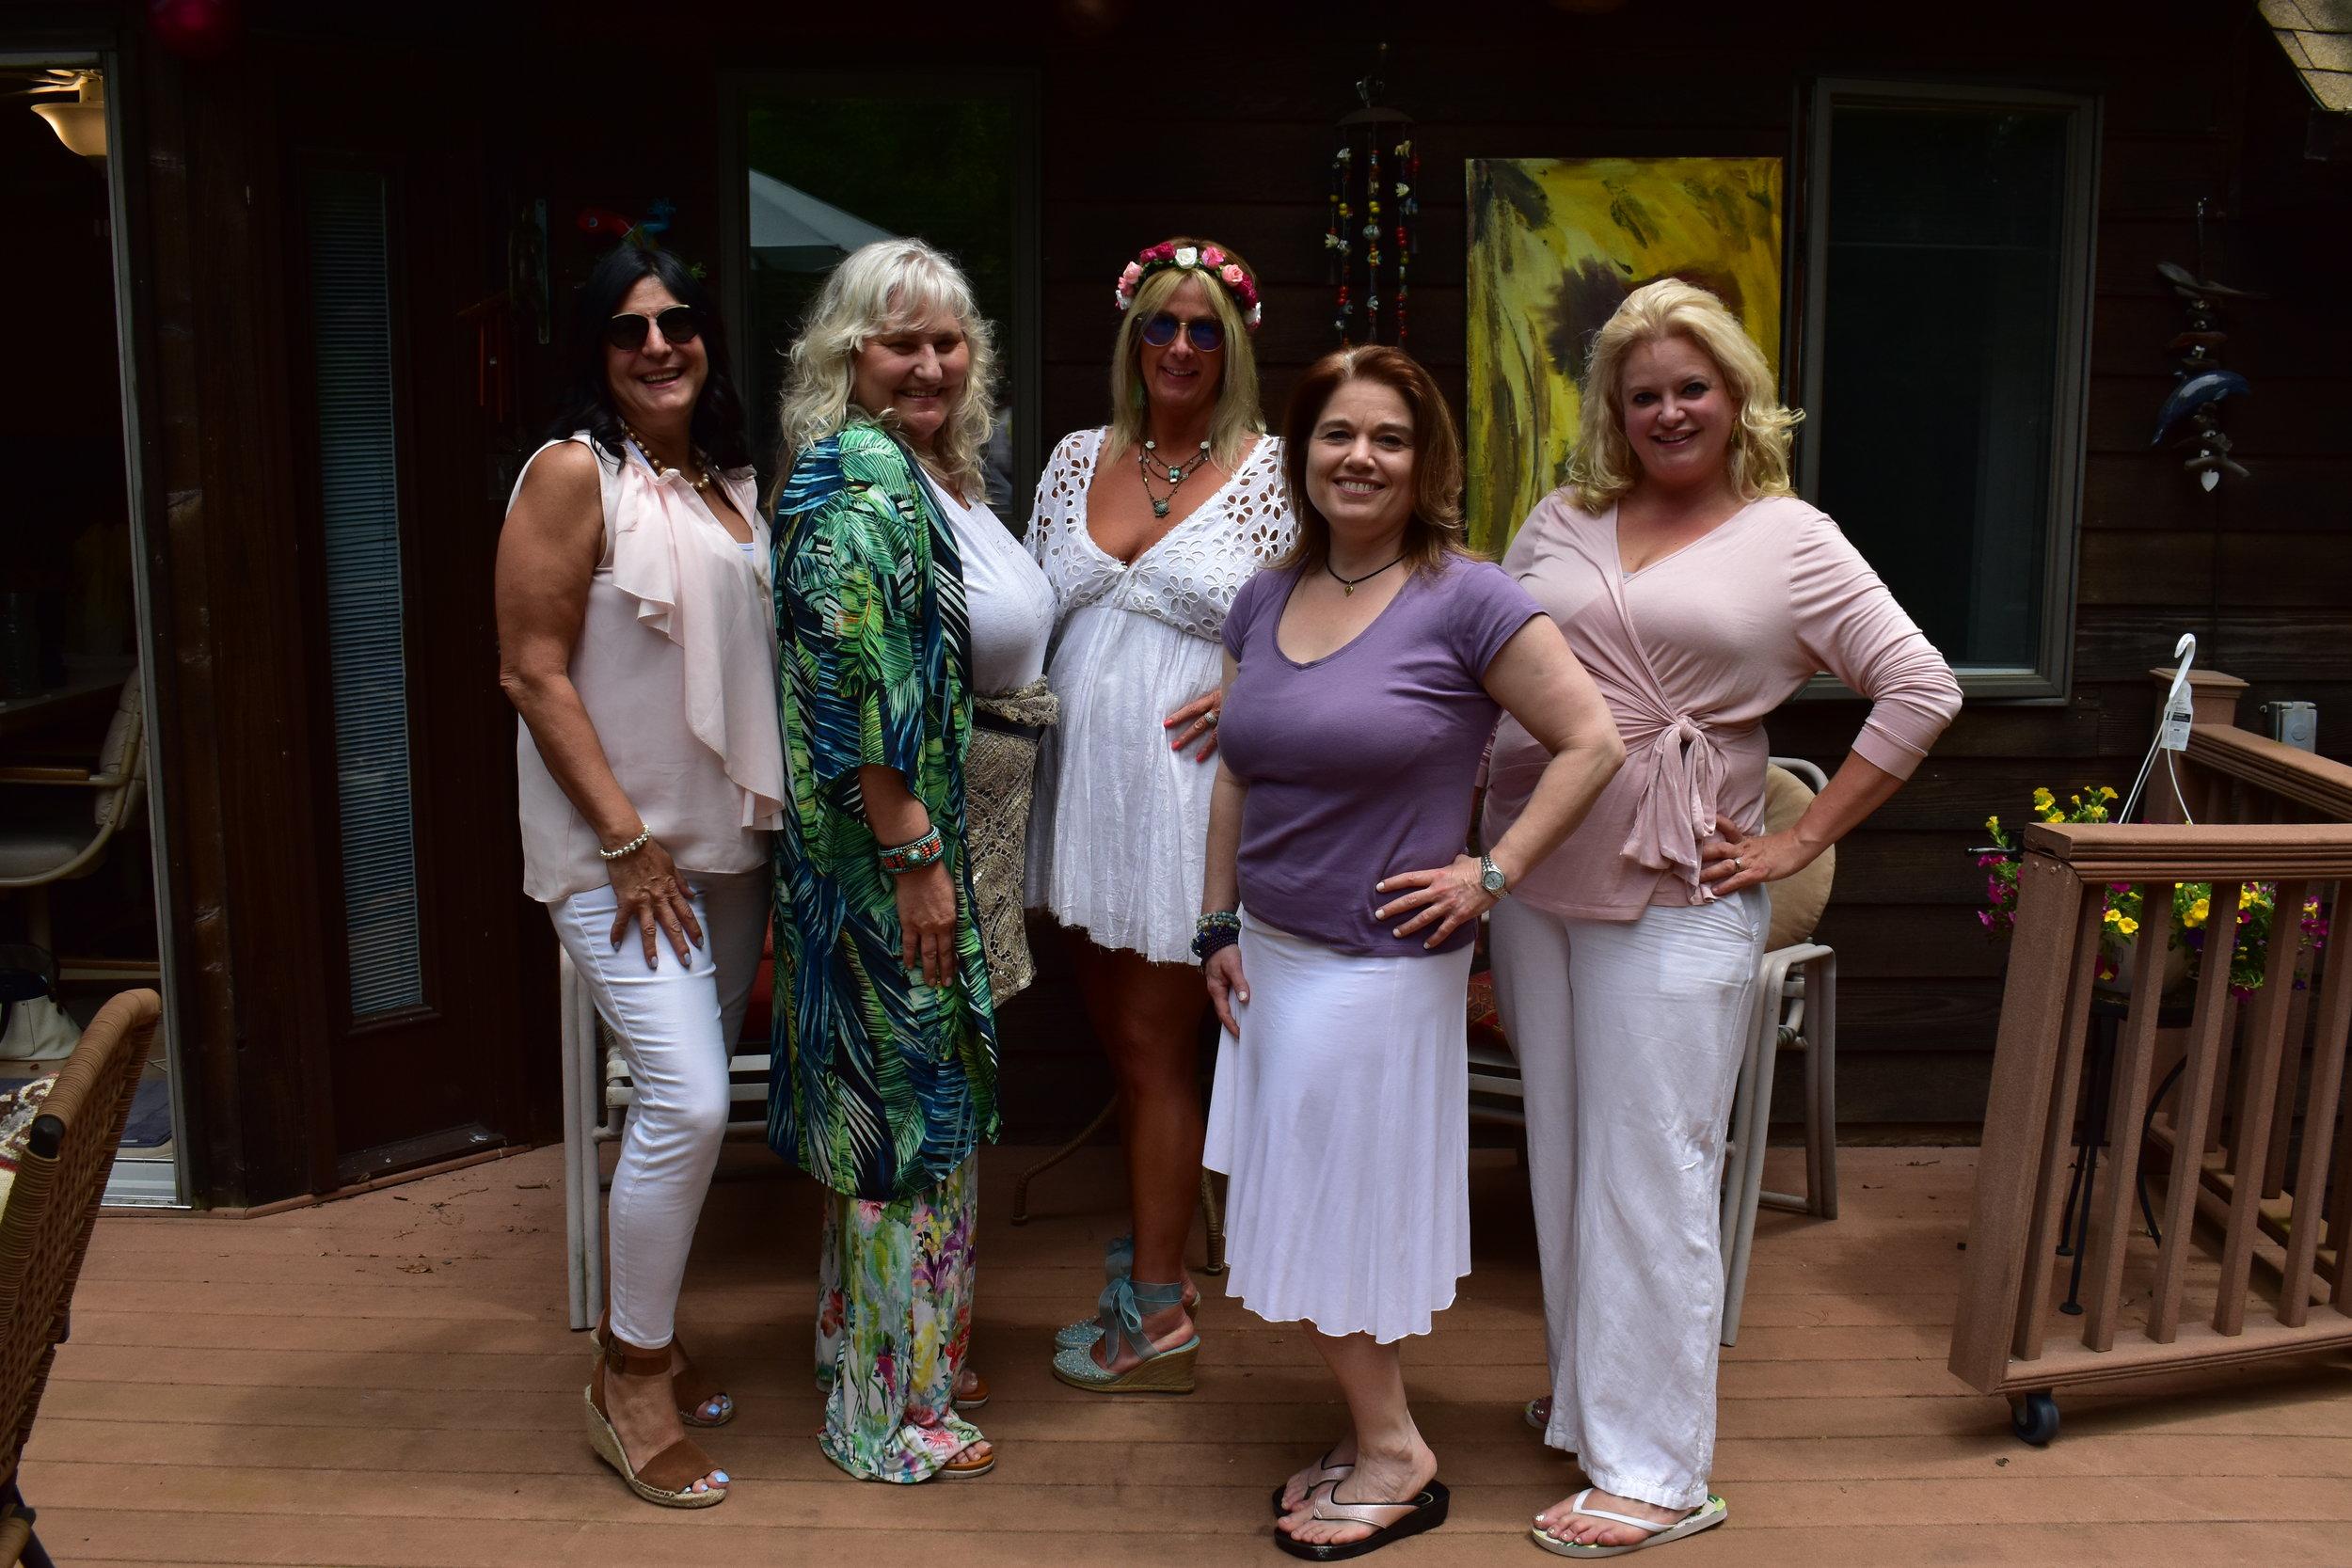 Stellar luxe feminine vitality and longevity flow with our sisterhood tribe